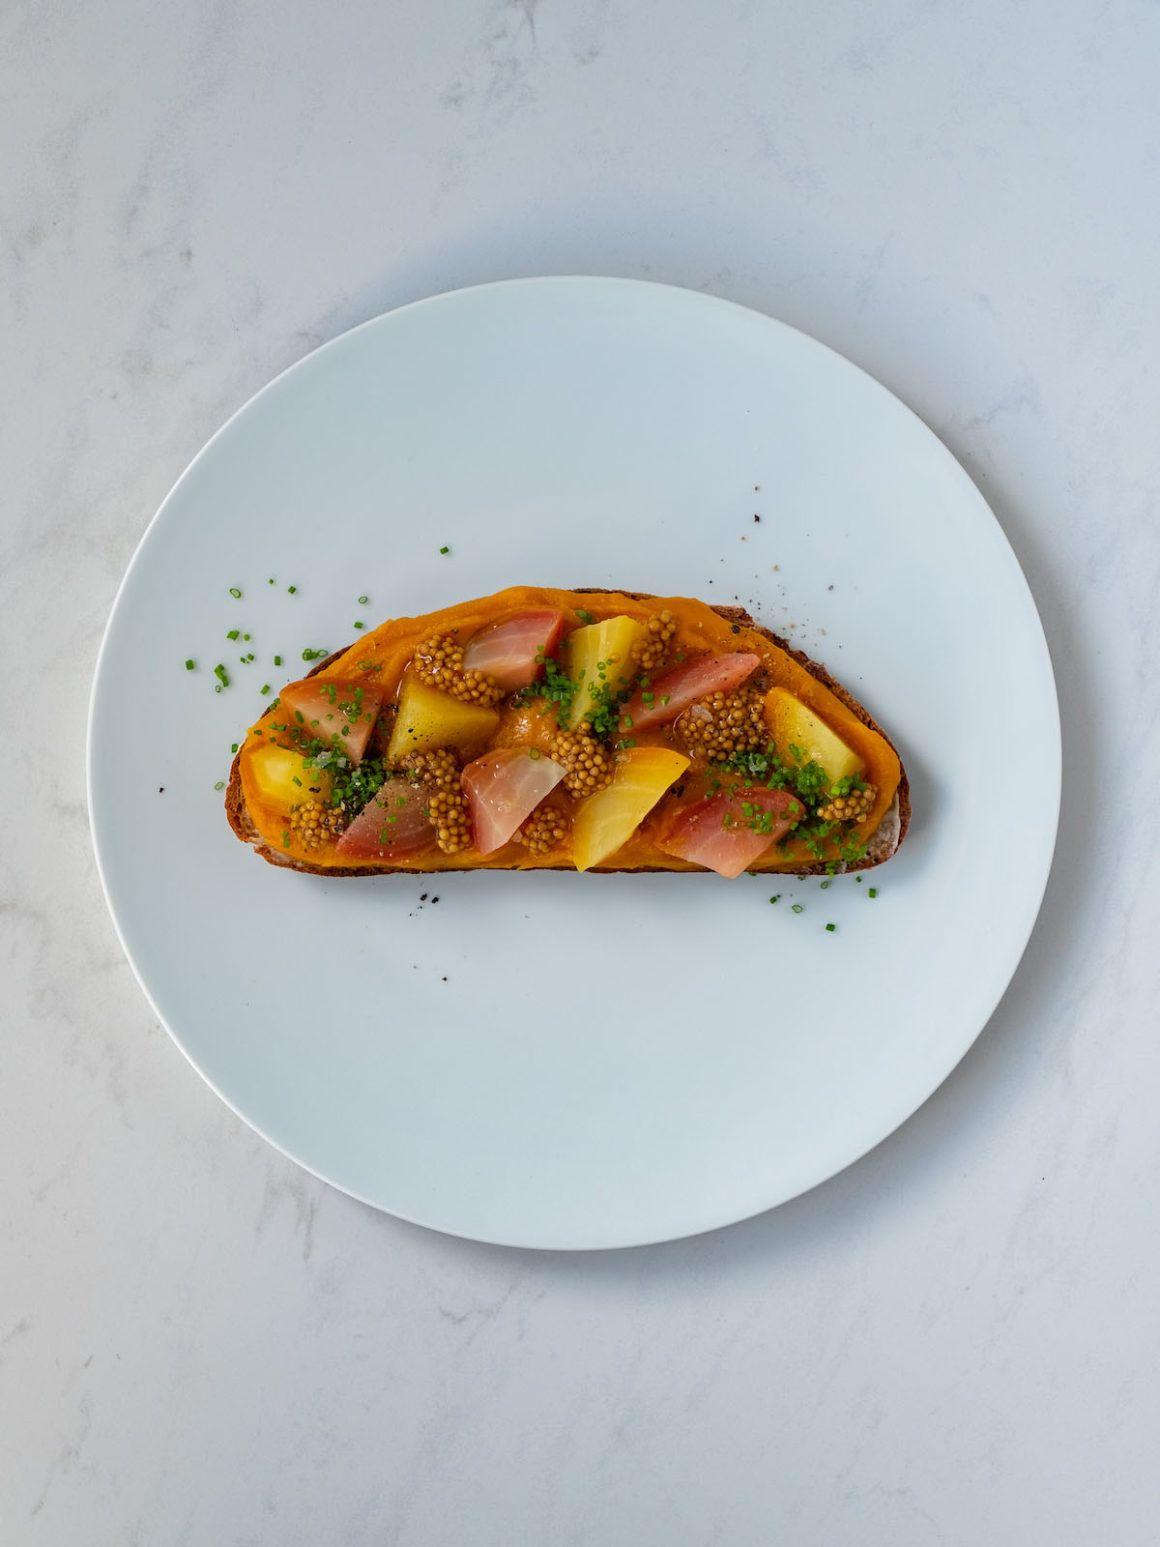 Foodblog, About Fuel, Rezept, Sandwich, Kürbis Zwiebel Marmelade, Gelbe Bete